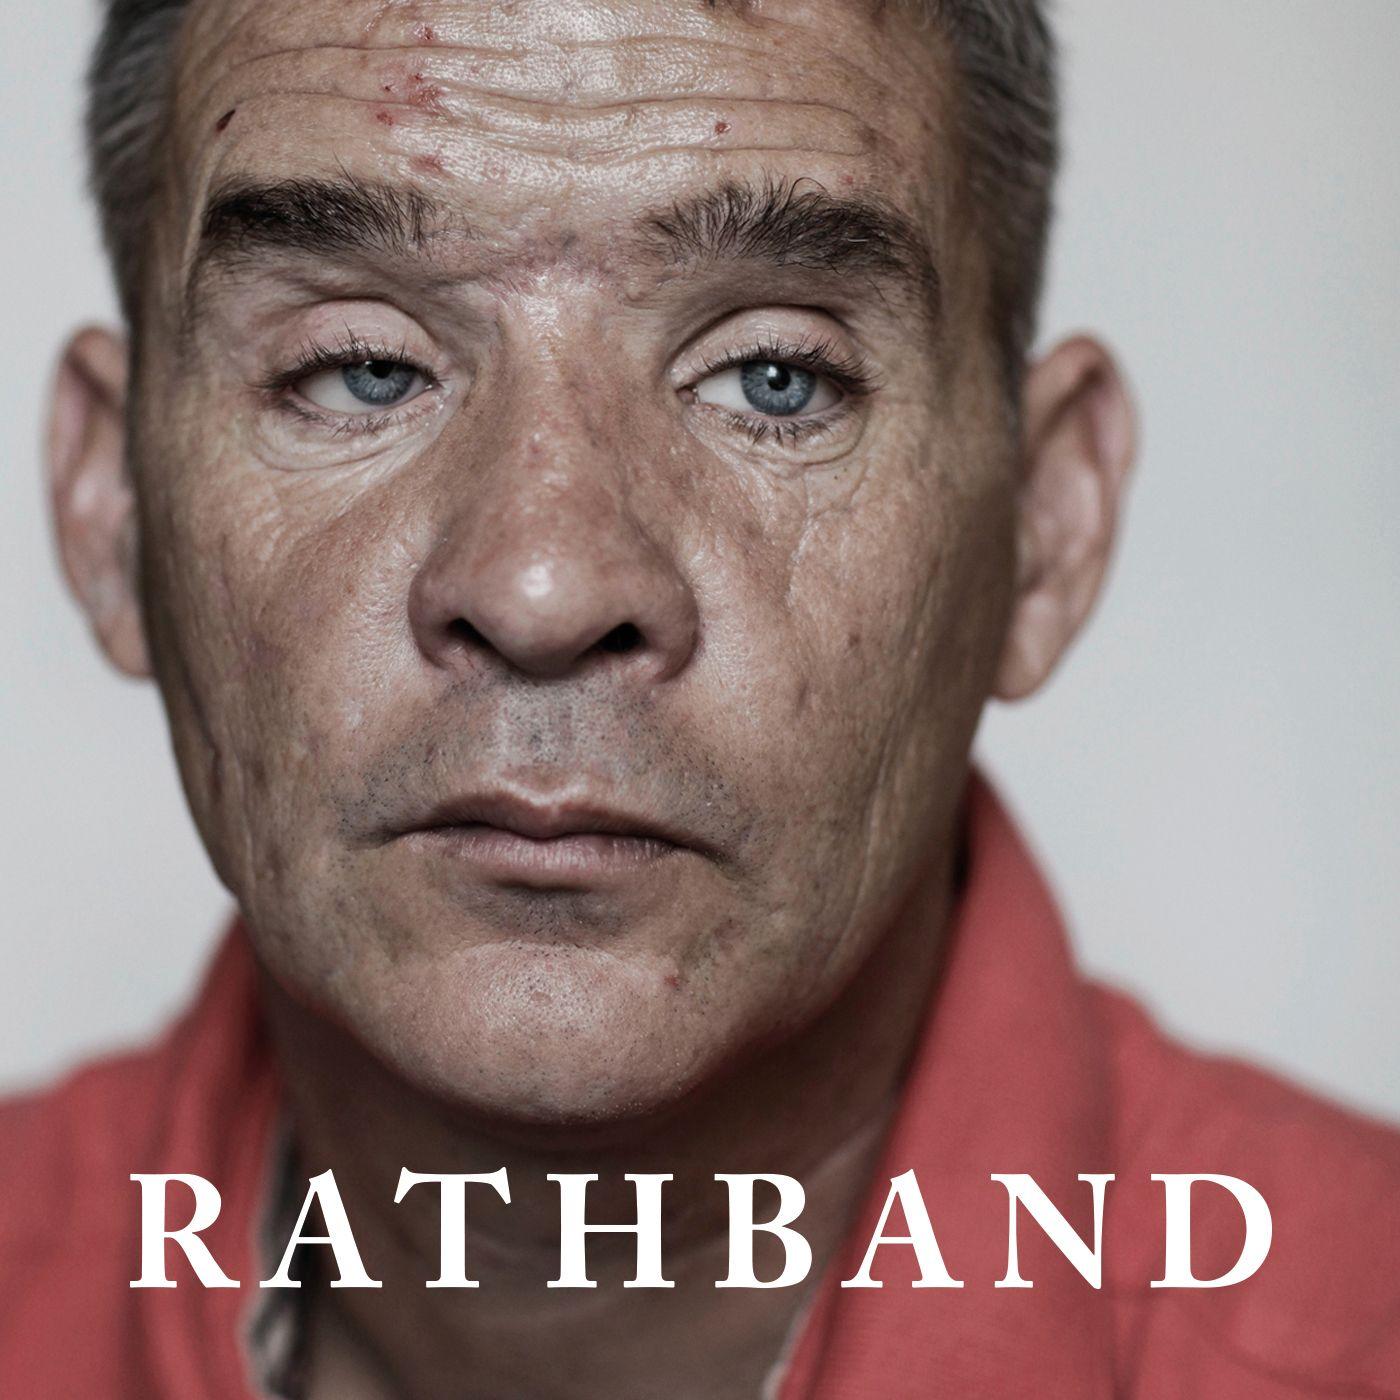 Rathband